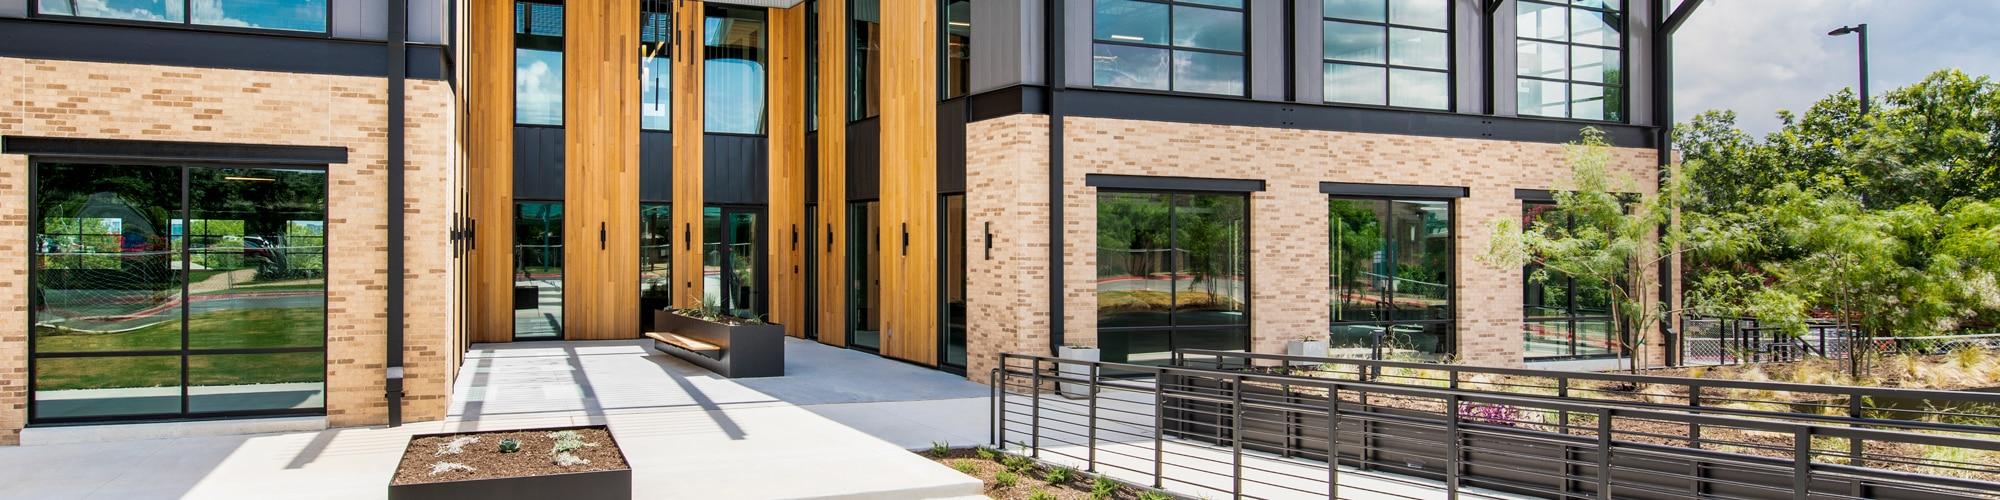 Penn-Field-Building-E-Exterior